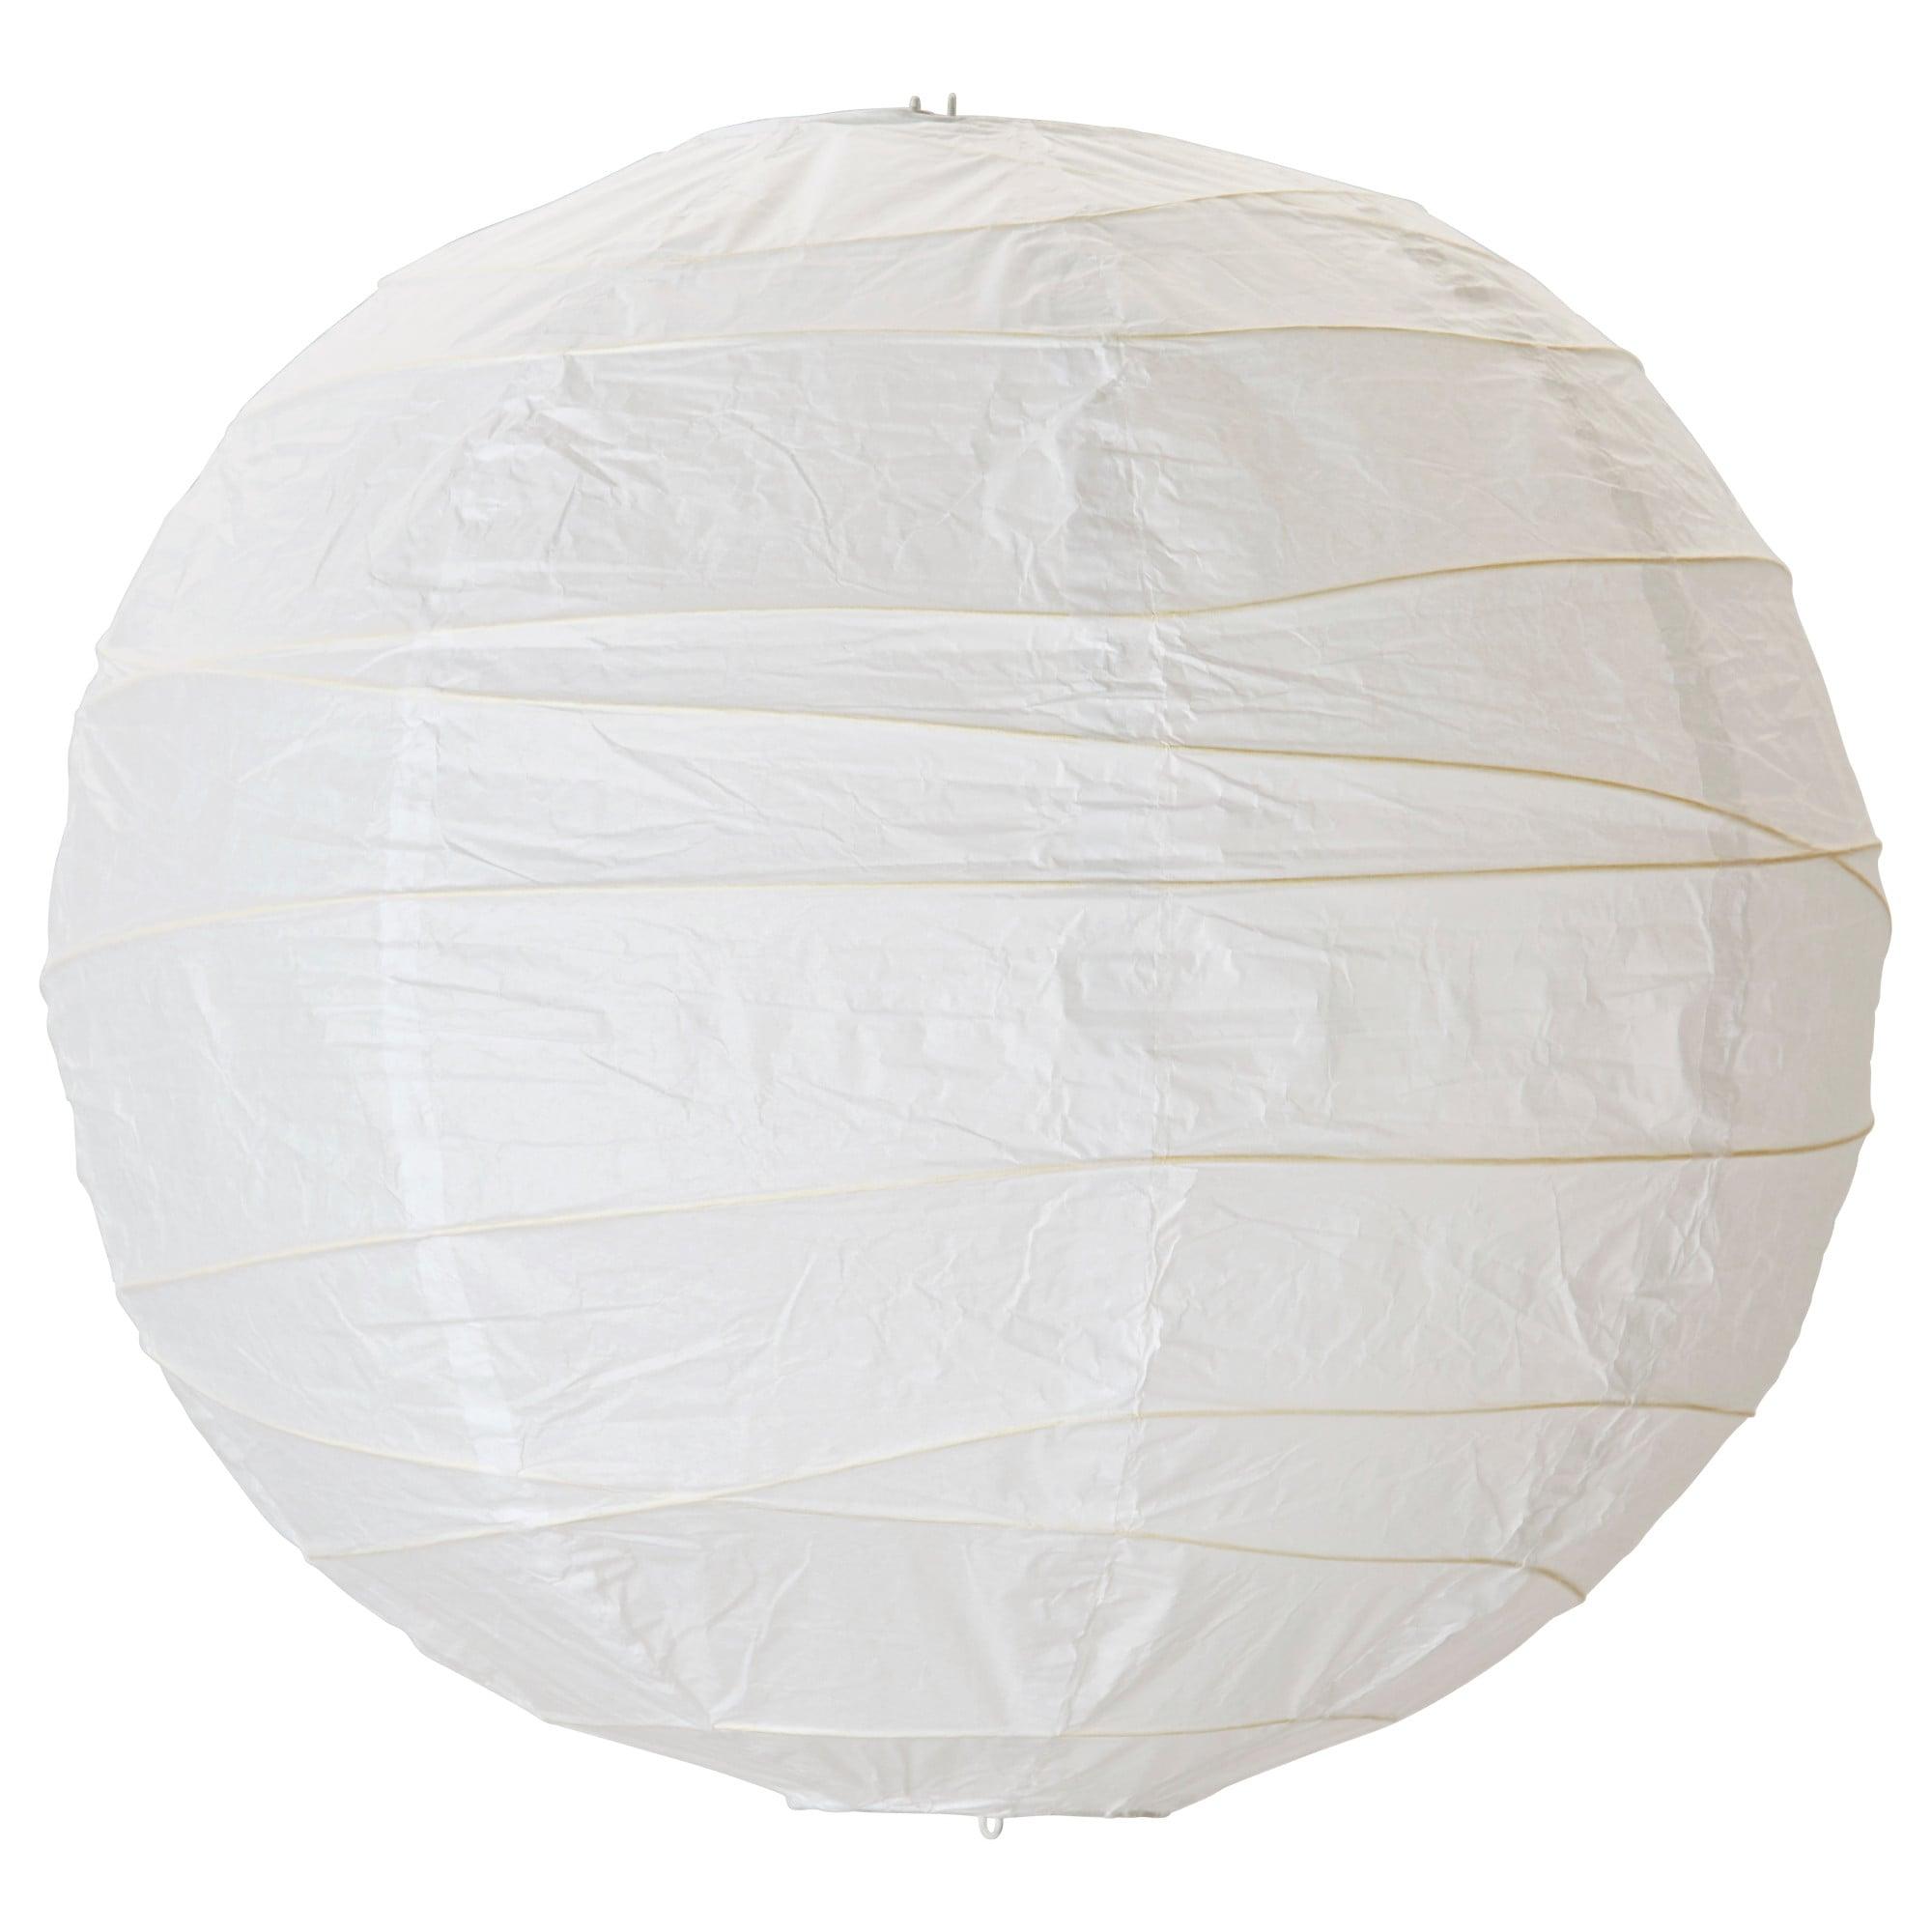 IKEA REGOLIT White Pendant Lamp Shade In 2019